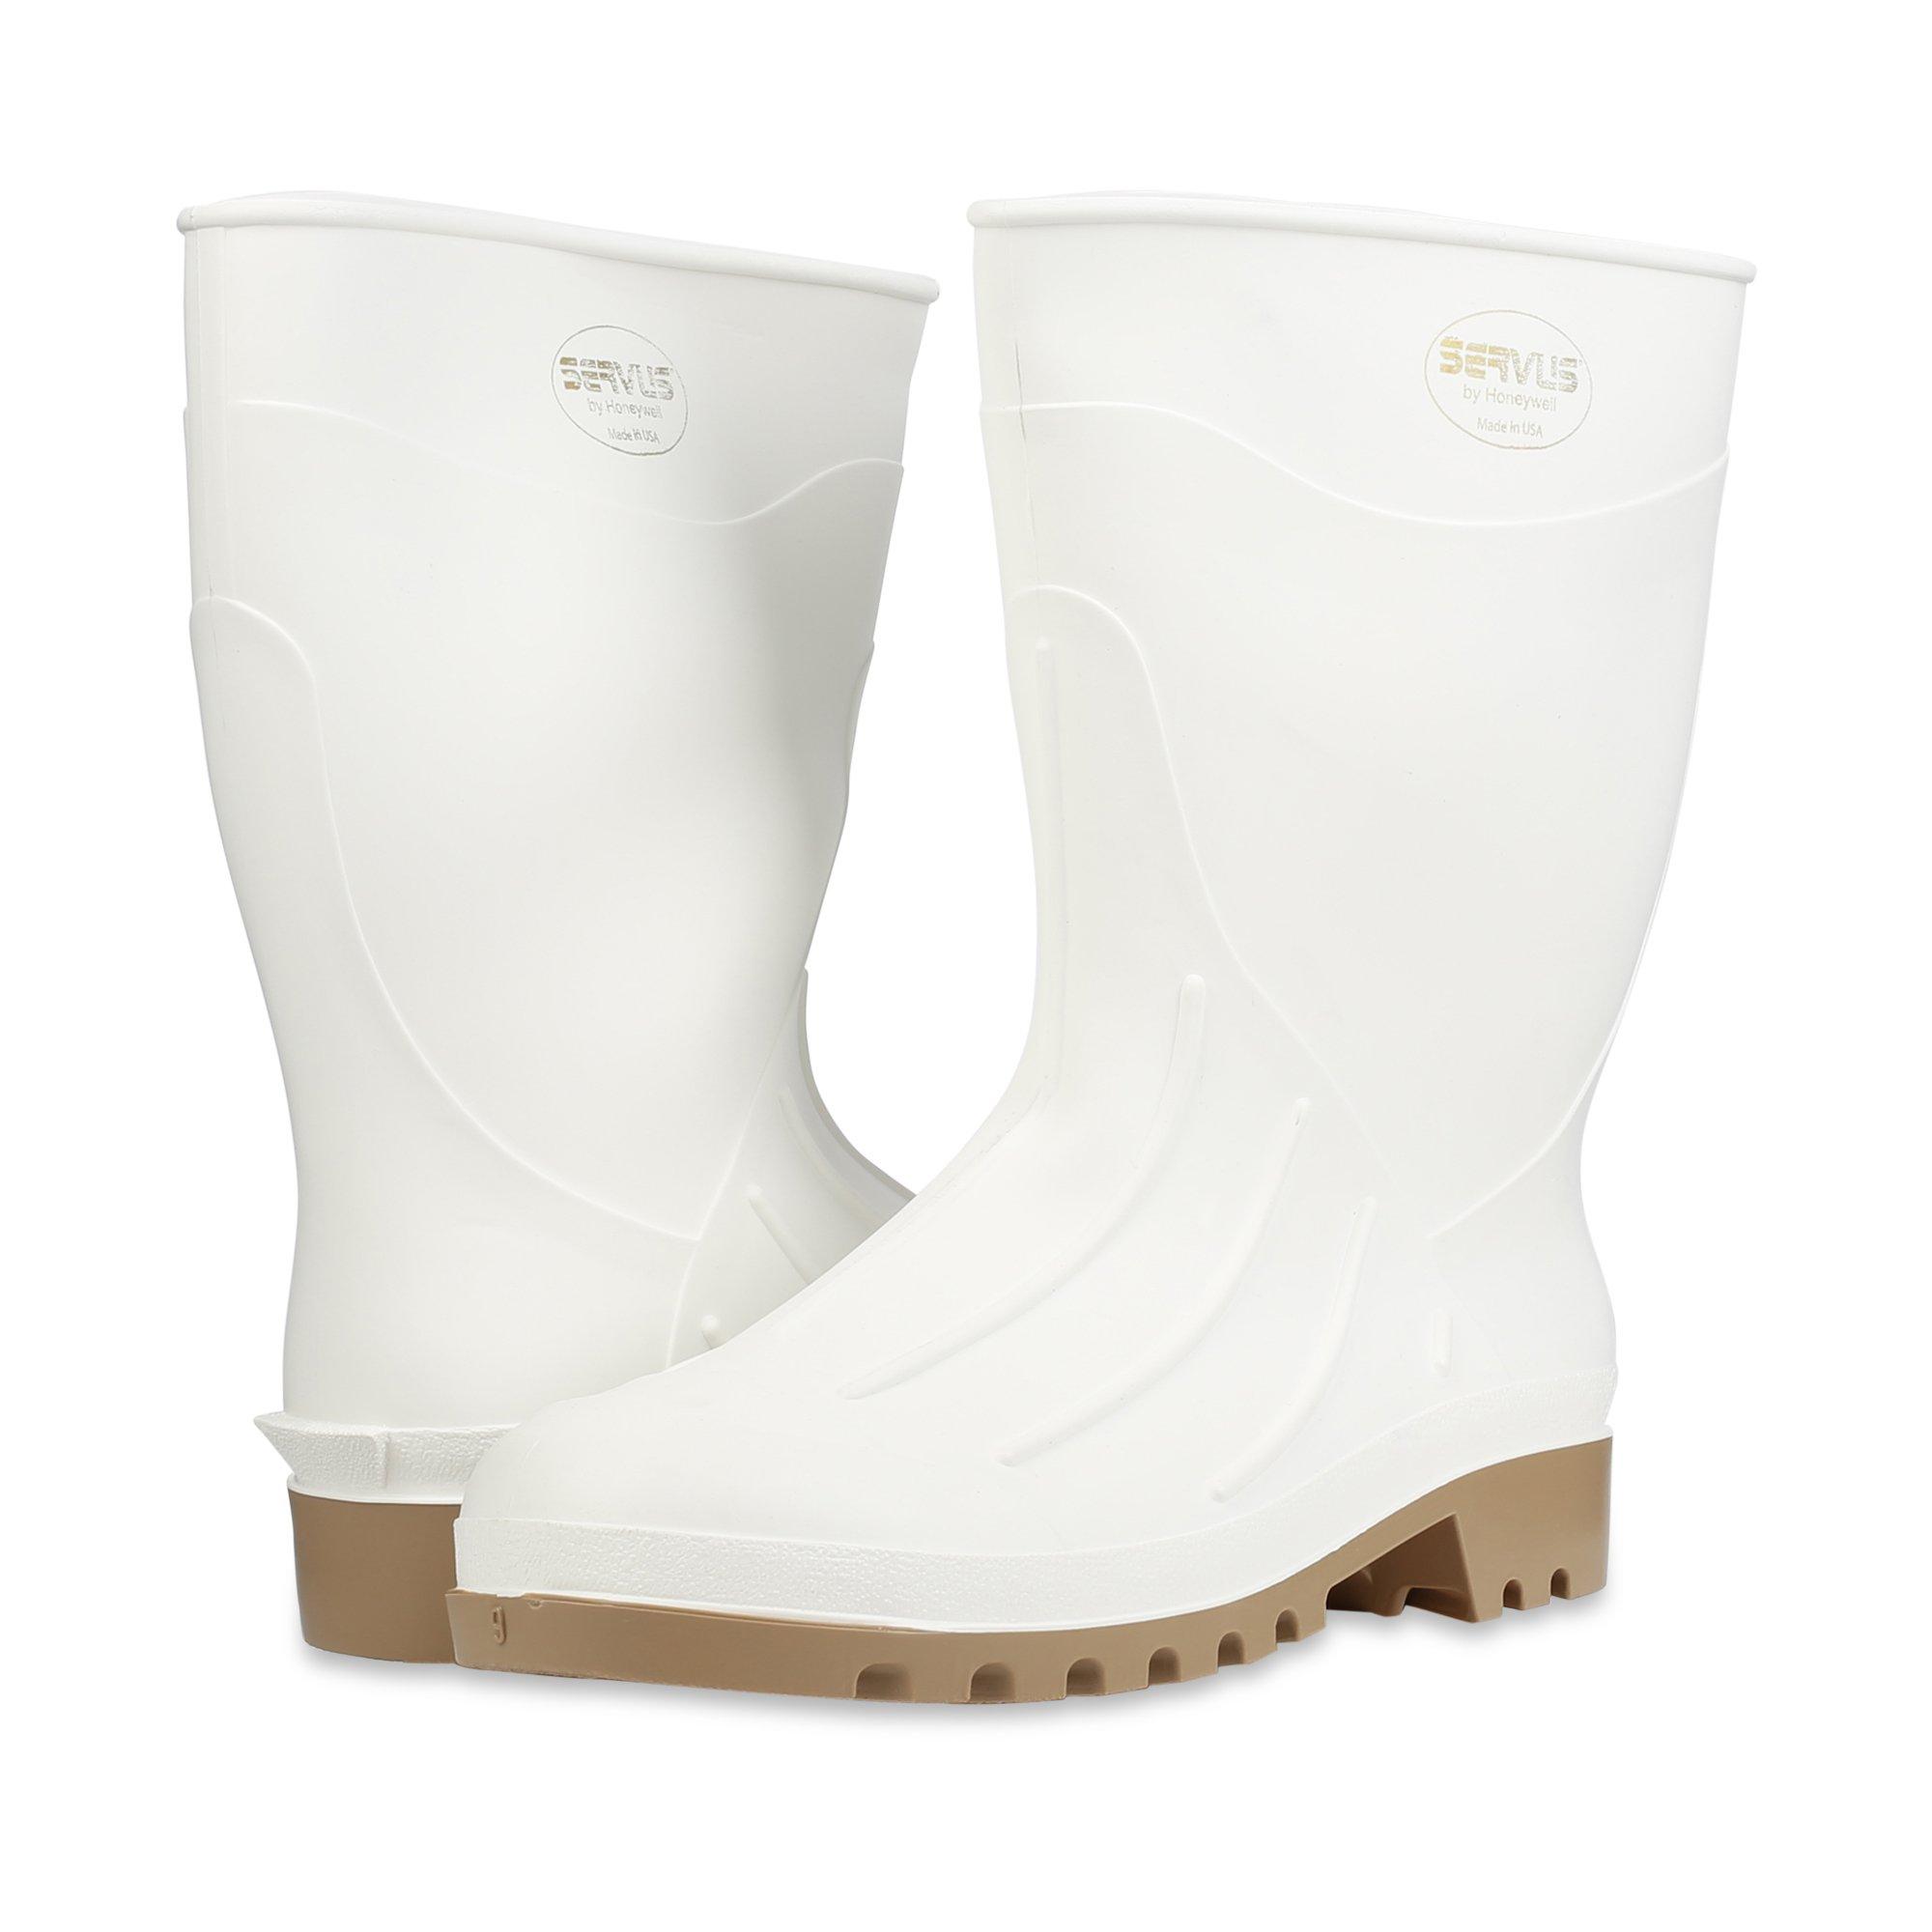 Servus 12'' PVC Polyblend Soft Toe Shrimp Boots, White (74928) by Honeywell (Image #7)